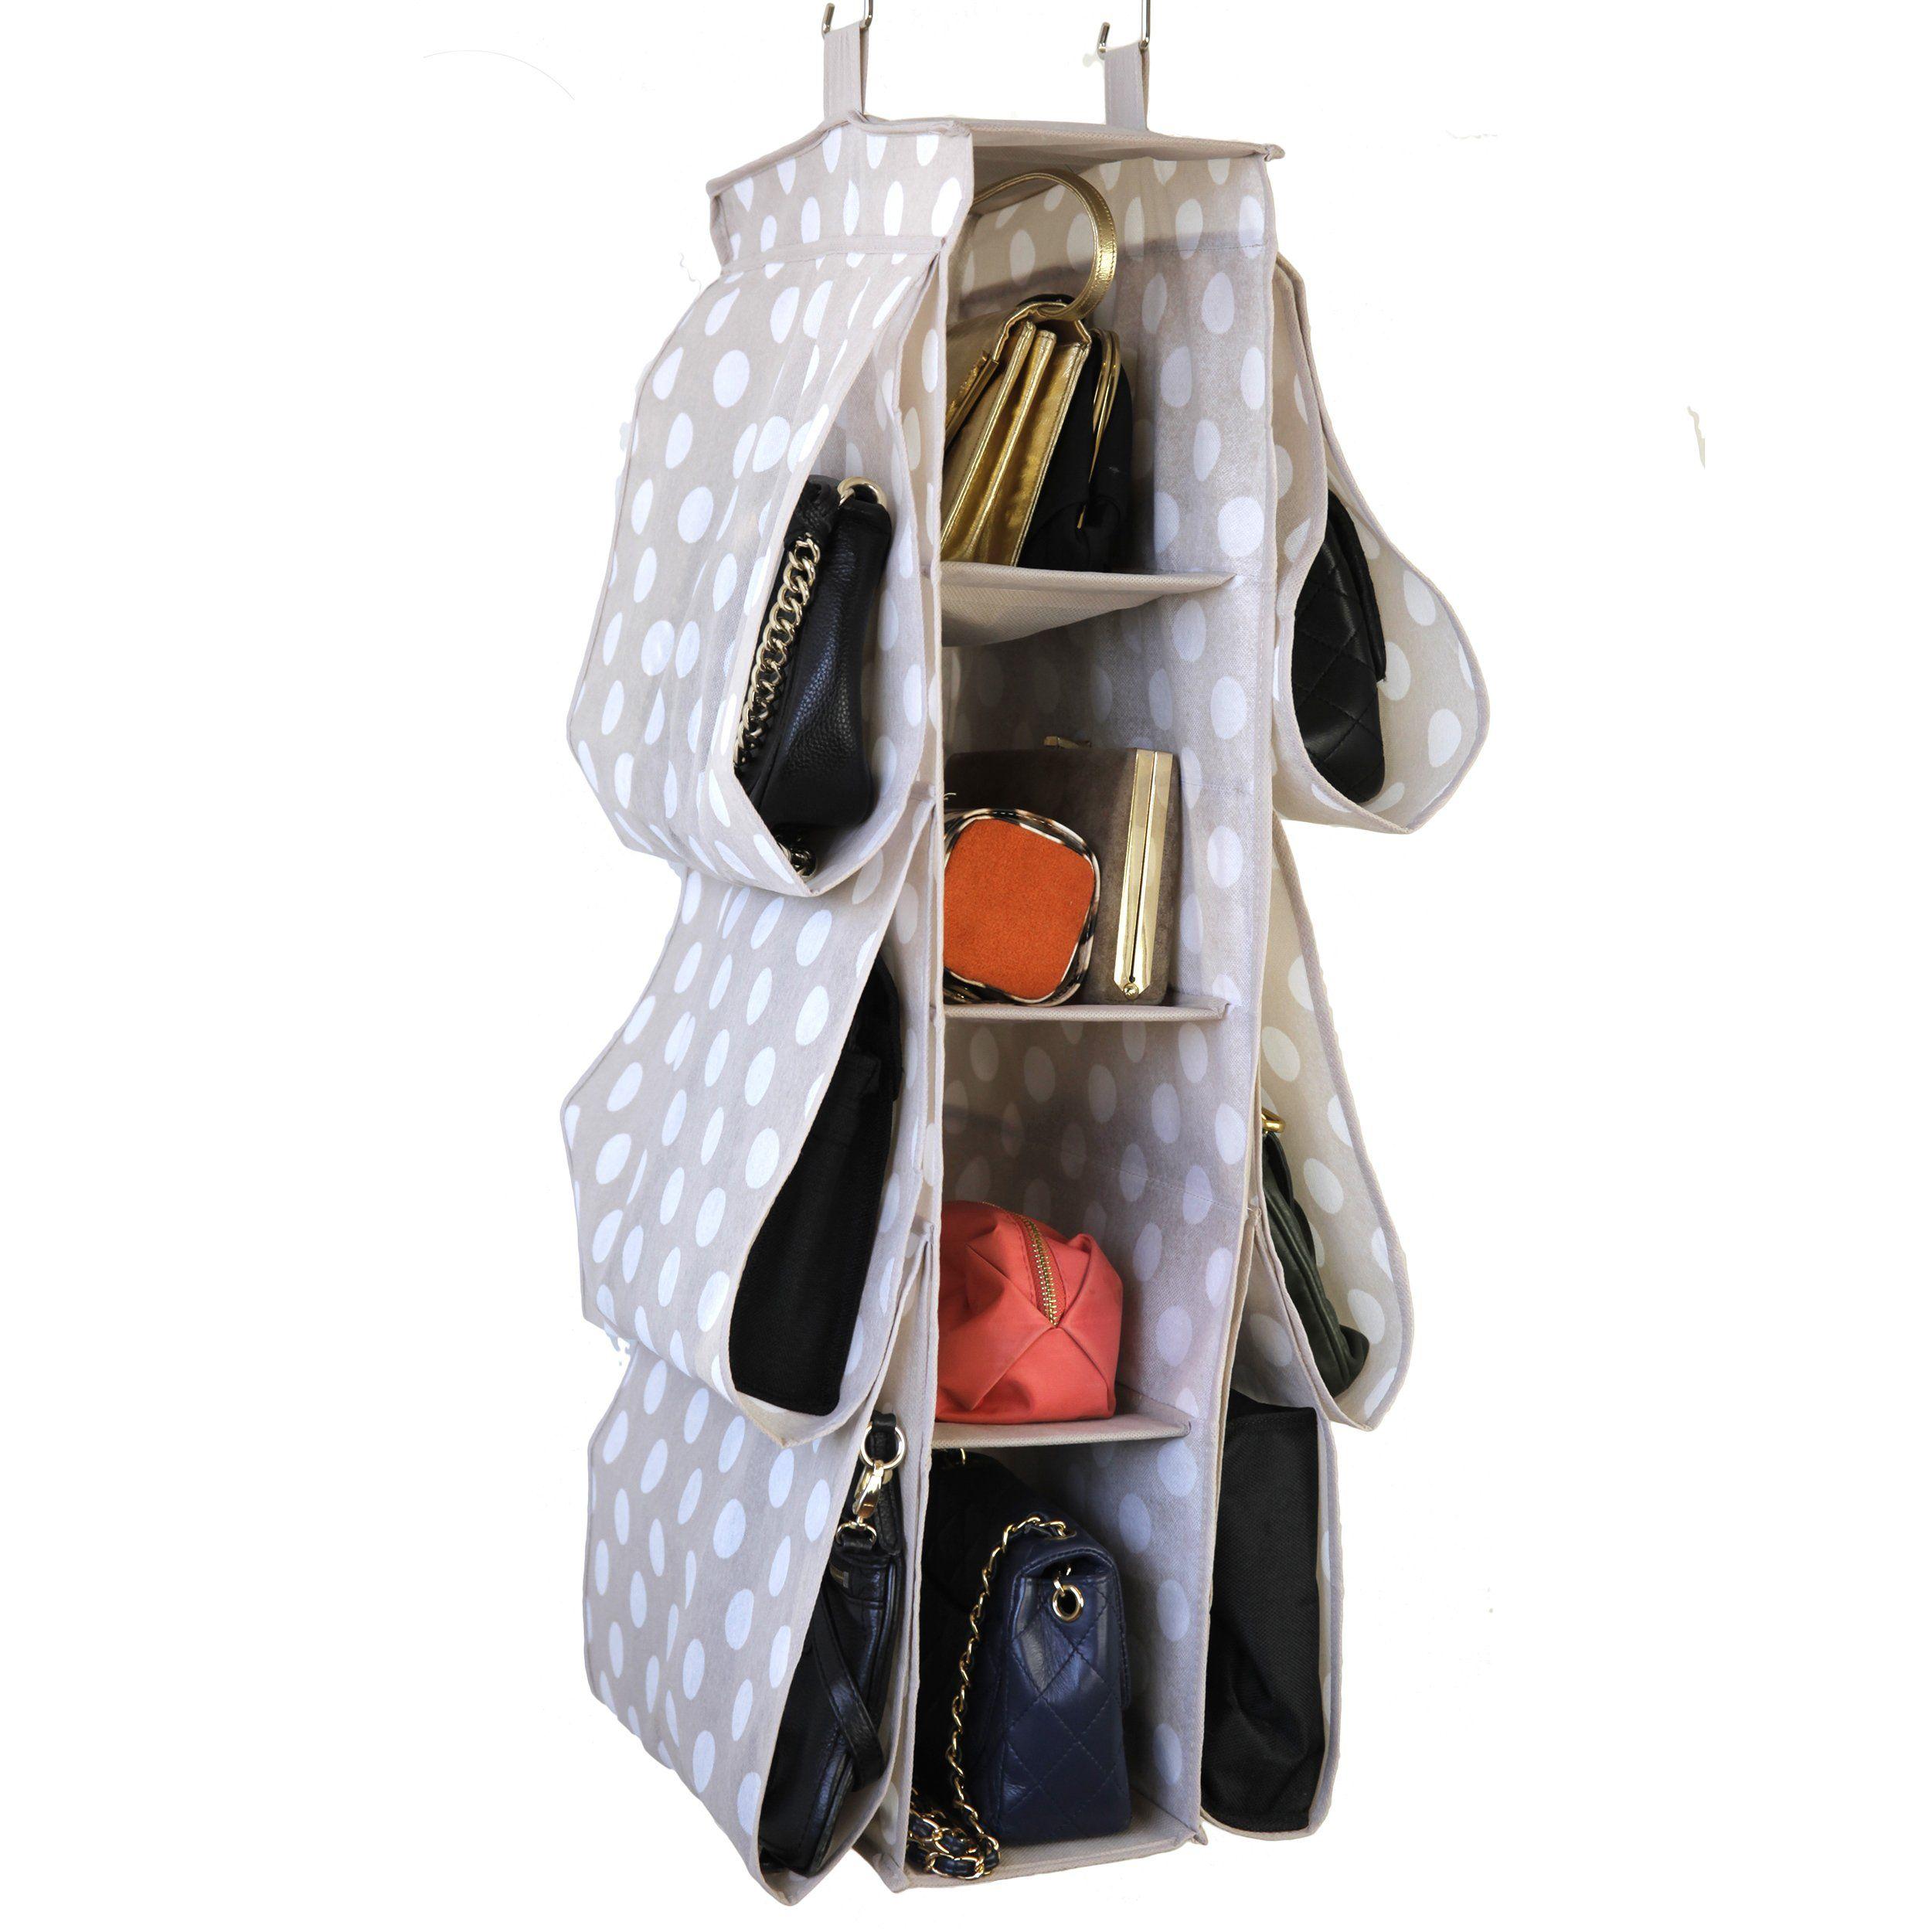 pants best interdesign hanging closet of aldo organizer grey walmart